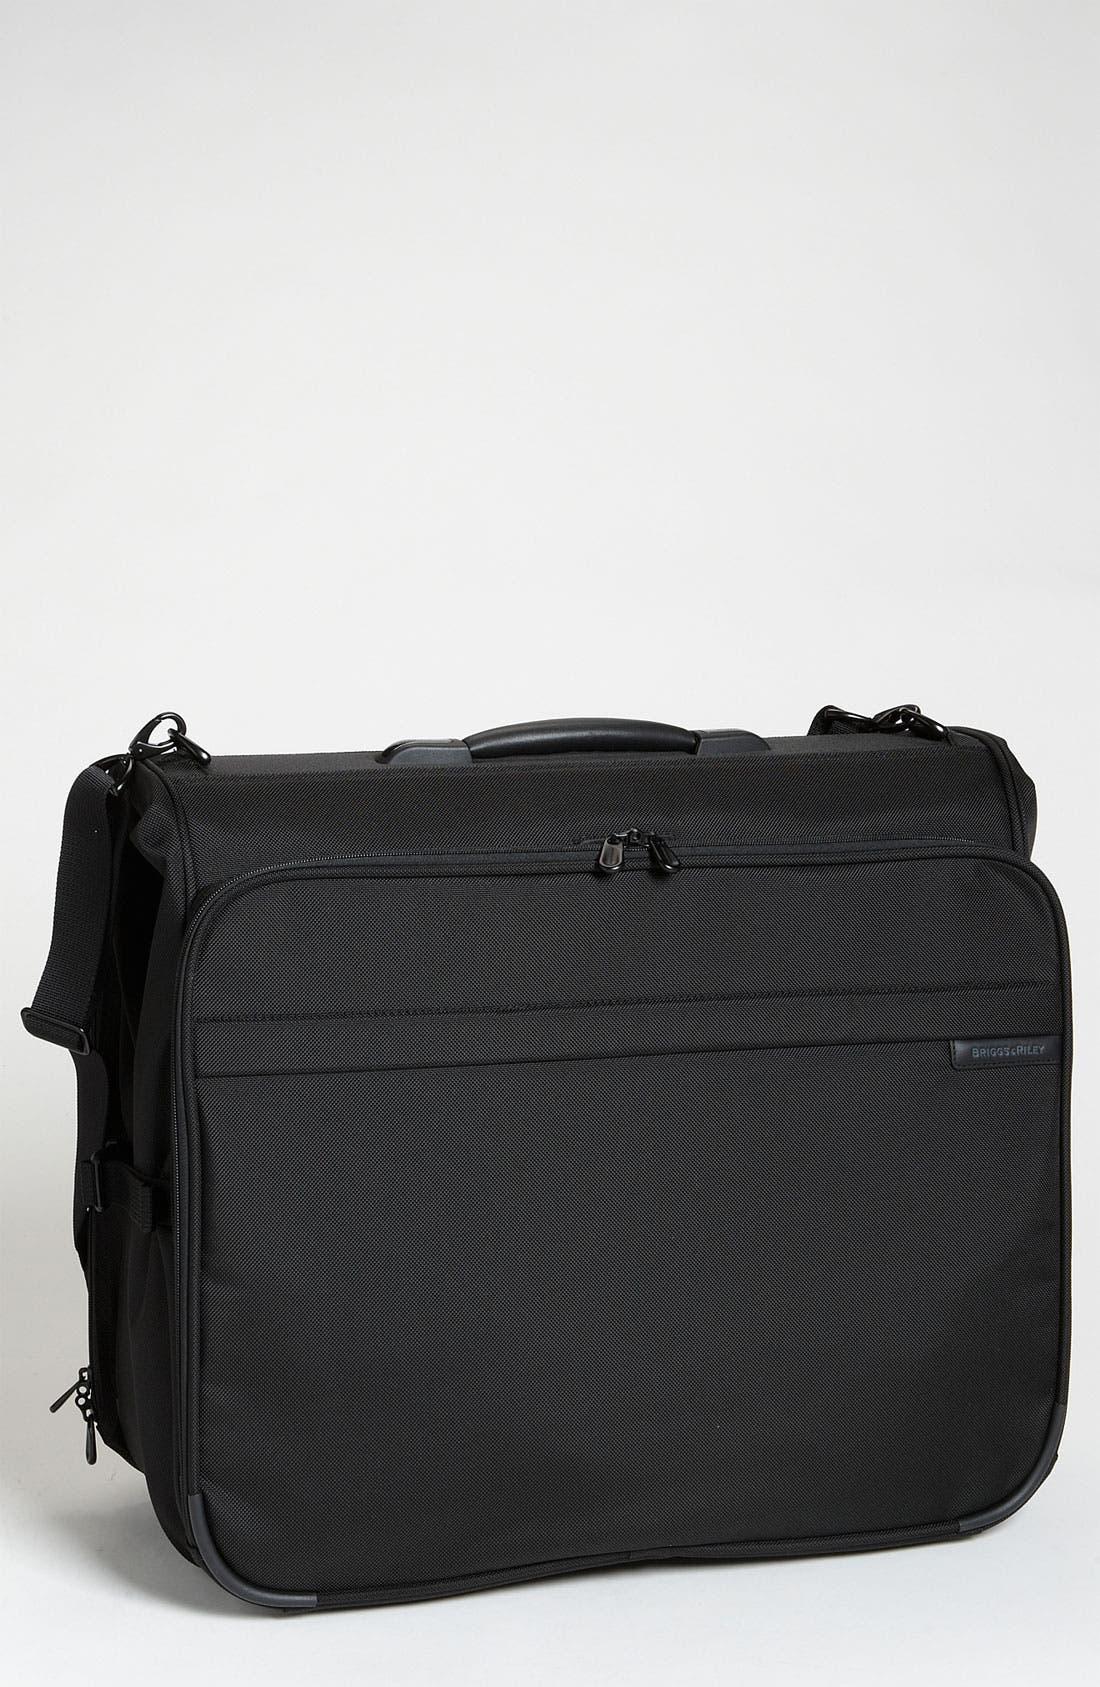 Briggs & Riley 'Baseline - Deluxe' Garment Bag (22 Inch)